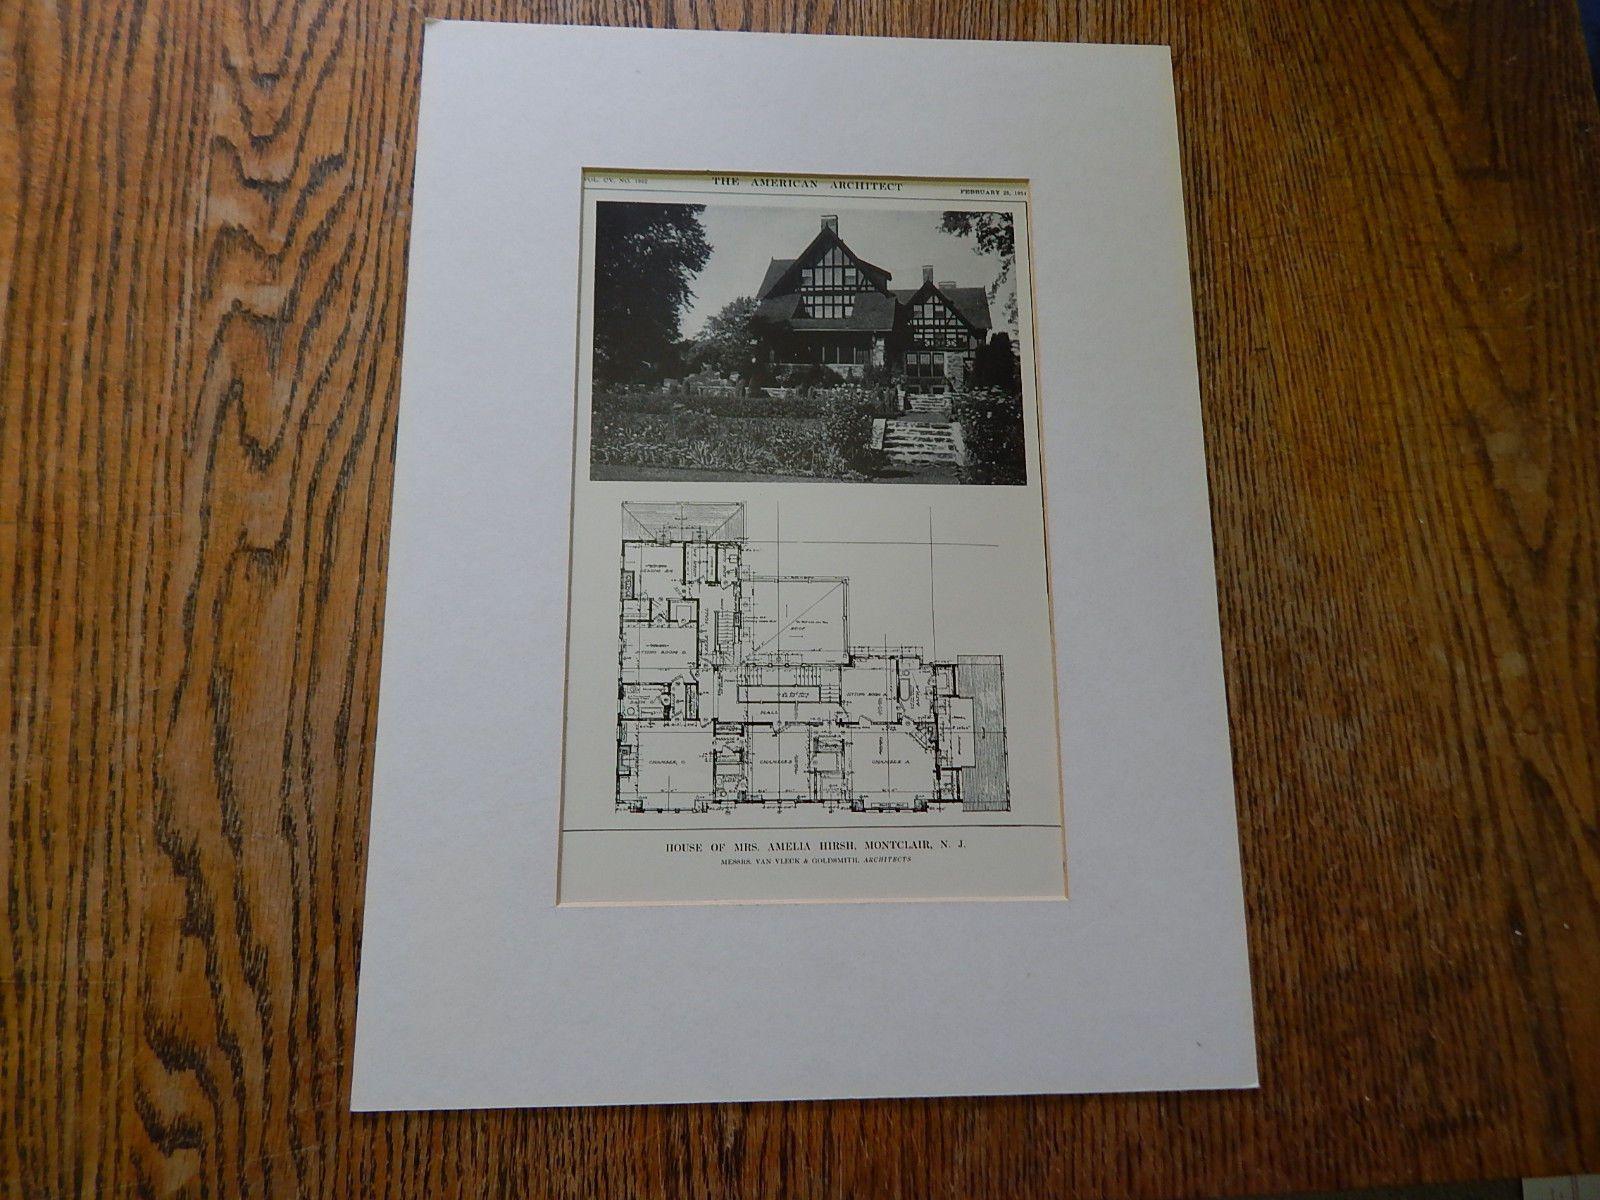 House of Mrs. Amelia Hirsh, Montclair, NJ, 1914. Van Vleck & Goldsmith.